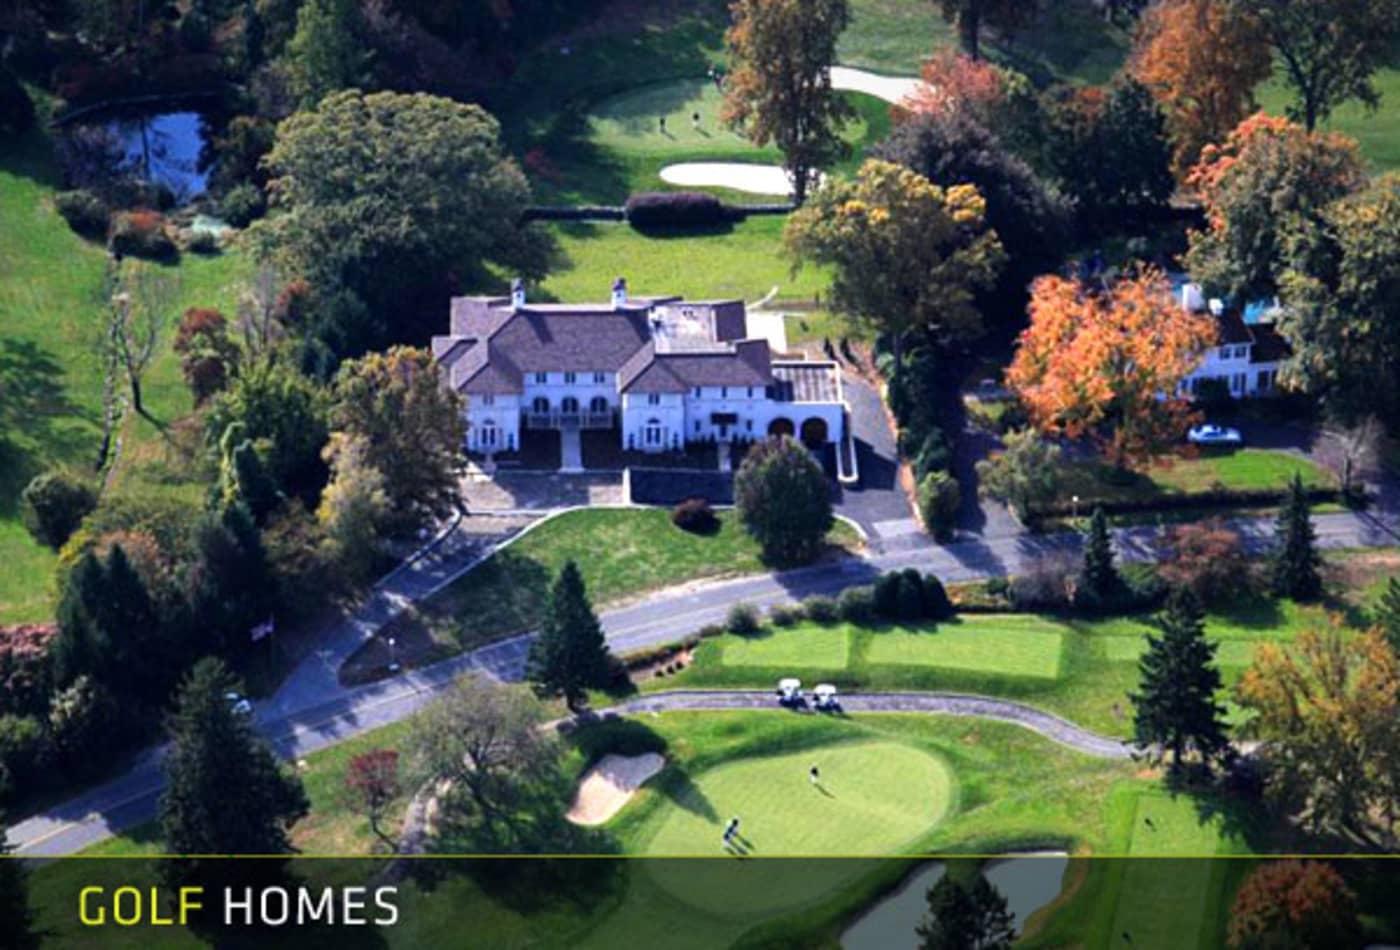 Westchester-New-York-Cover-Golf-Homes-CNBC.jpg